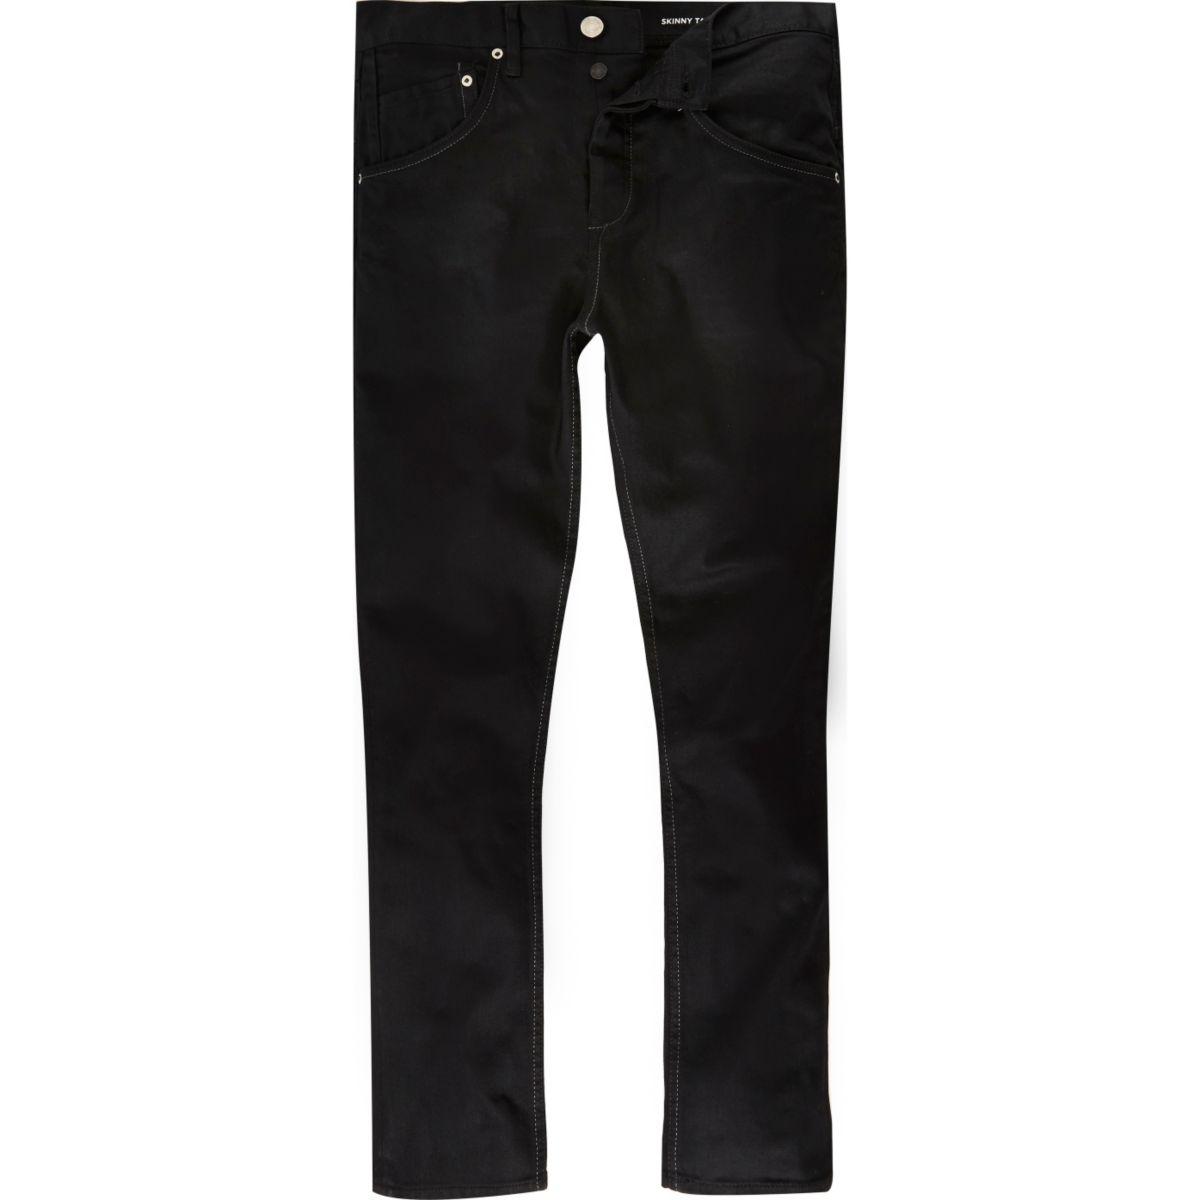 Black Chester skinny tapered jeans